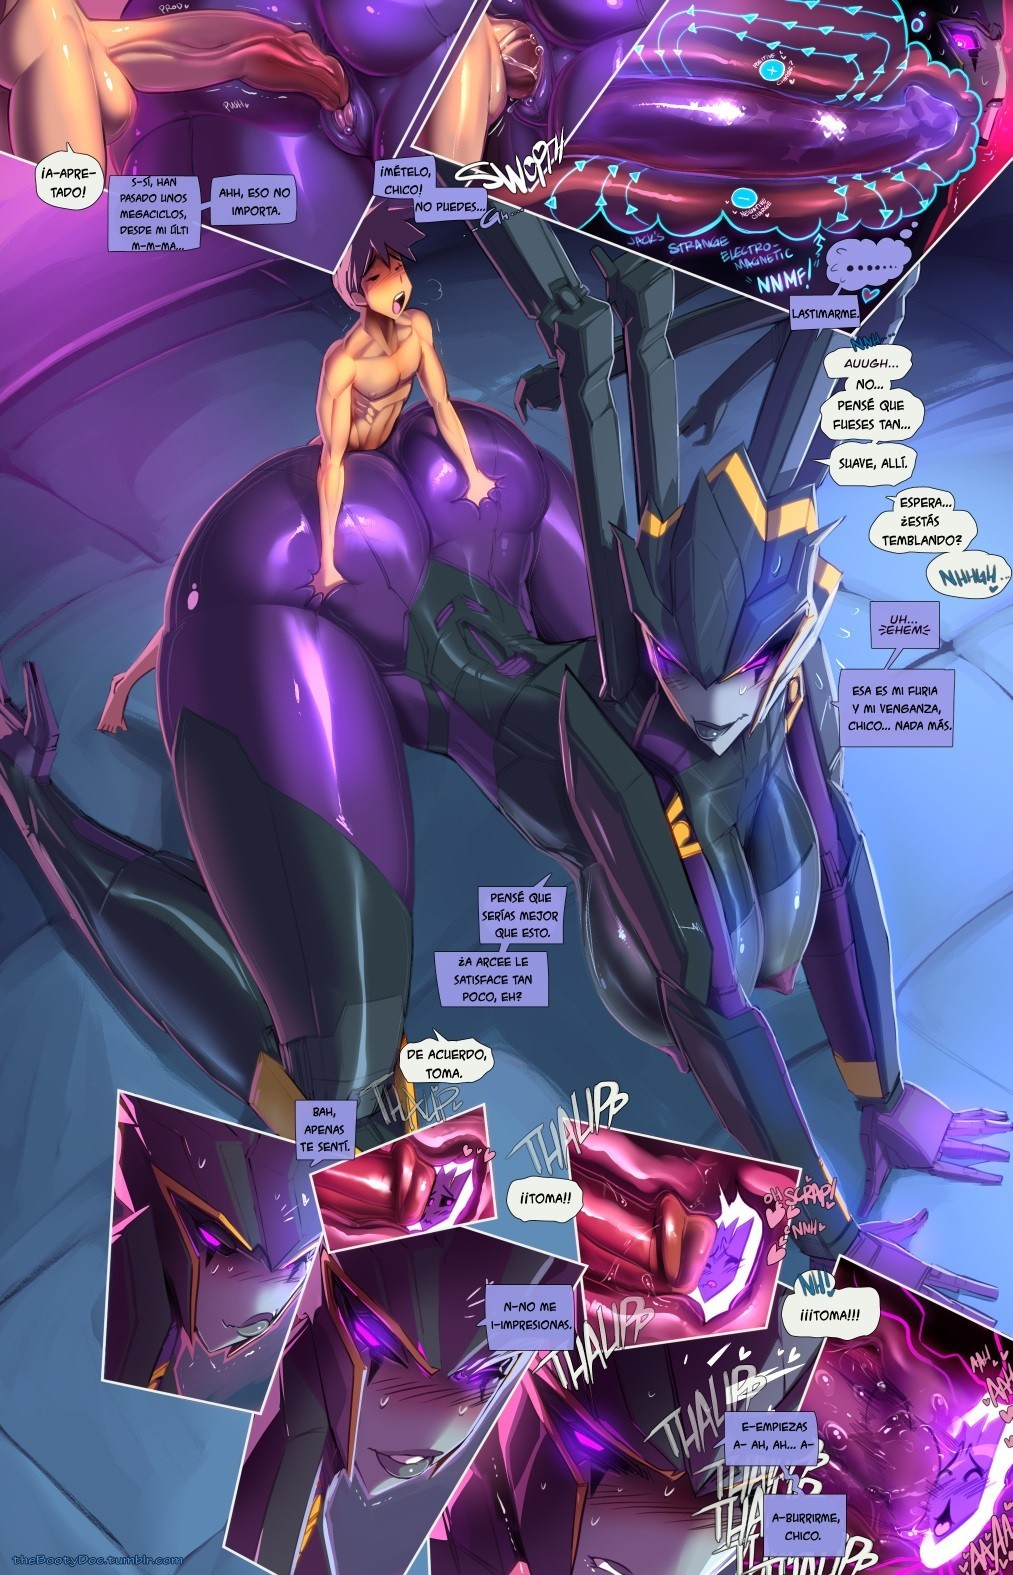 Sarja kuva porno Transformers